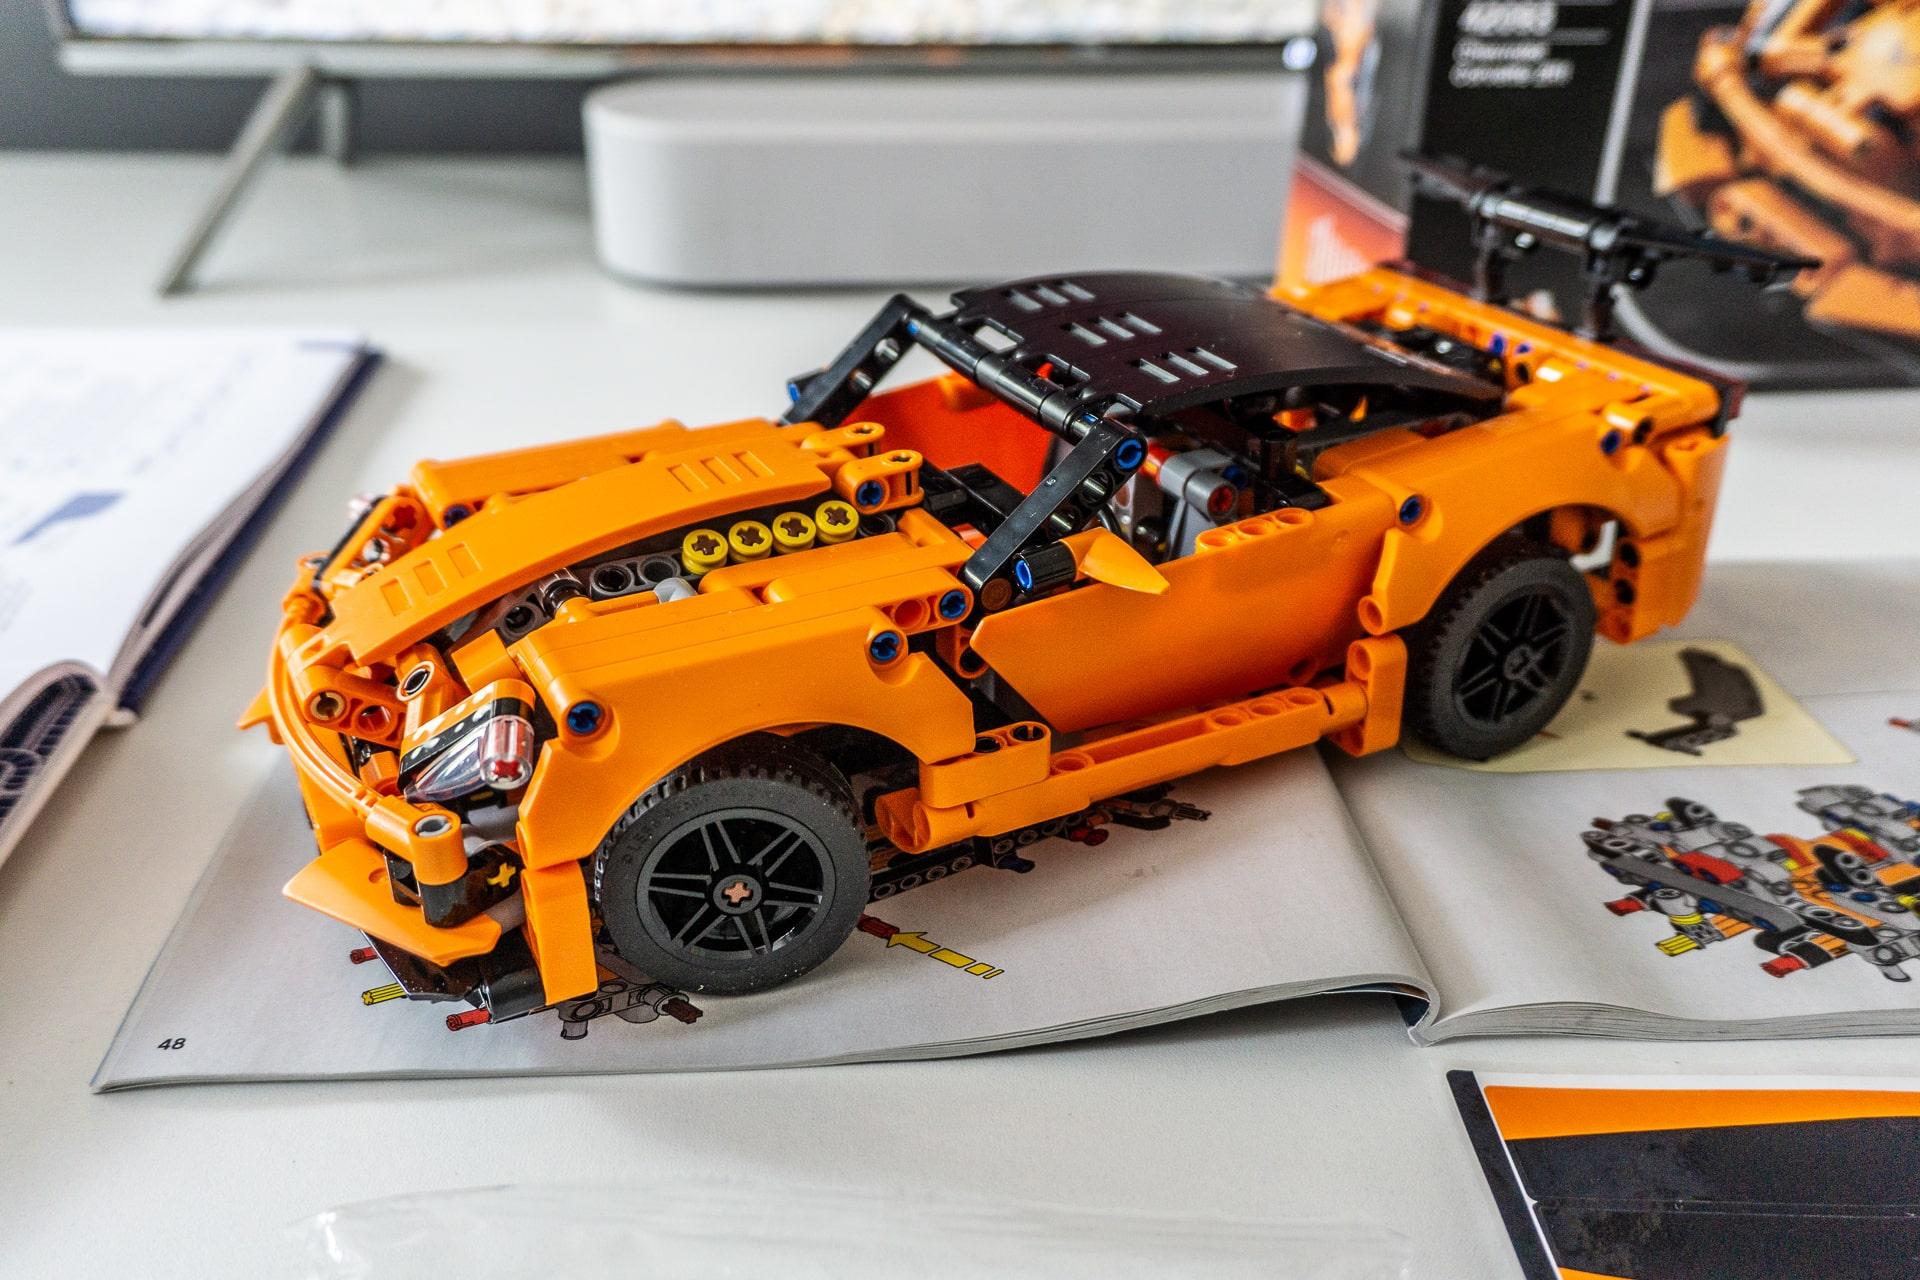 Kami bermain tanpa listrik: LEGO Chevrolet Corvette ZR1 ...